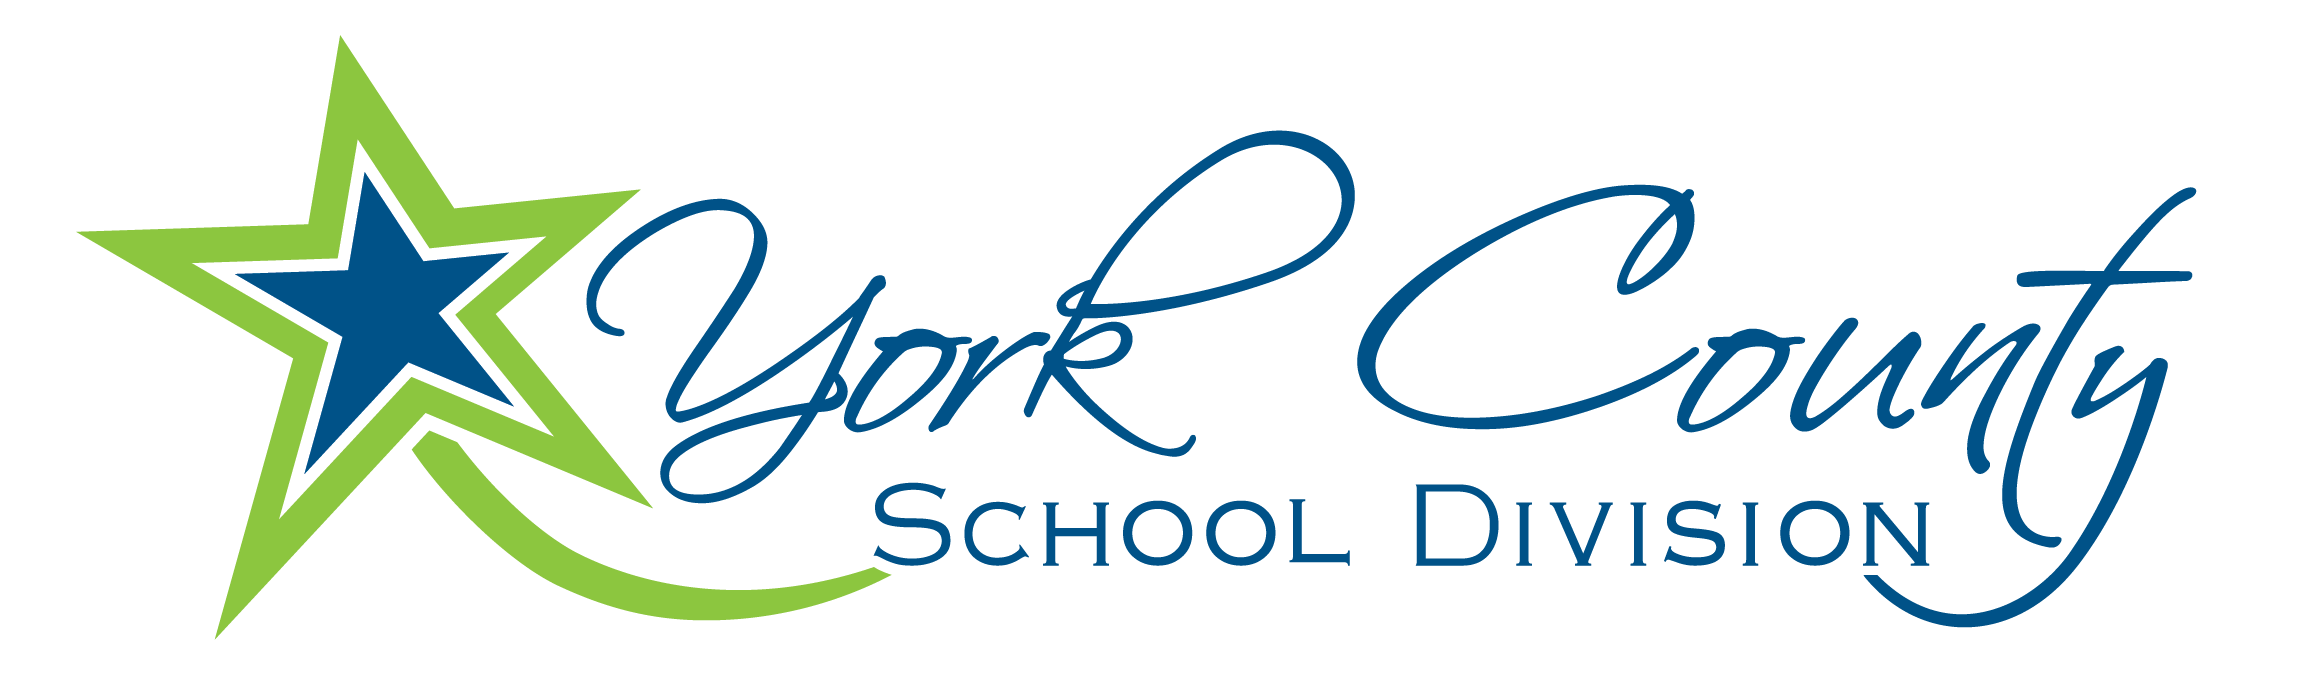 York County School Division